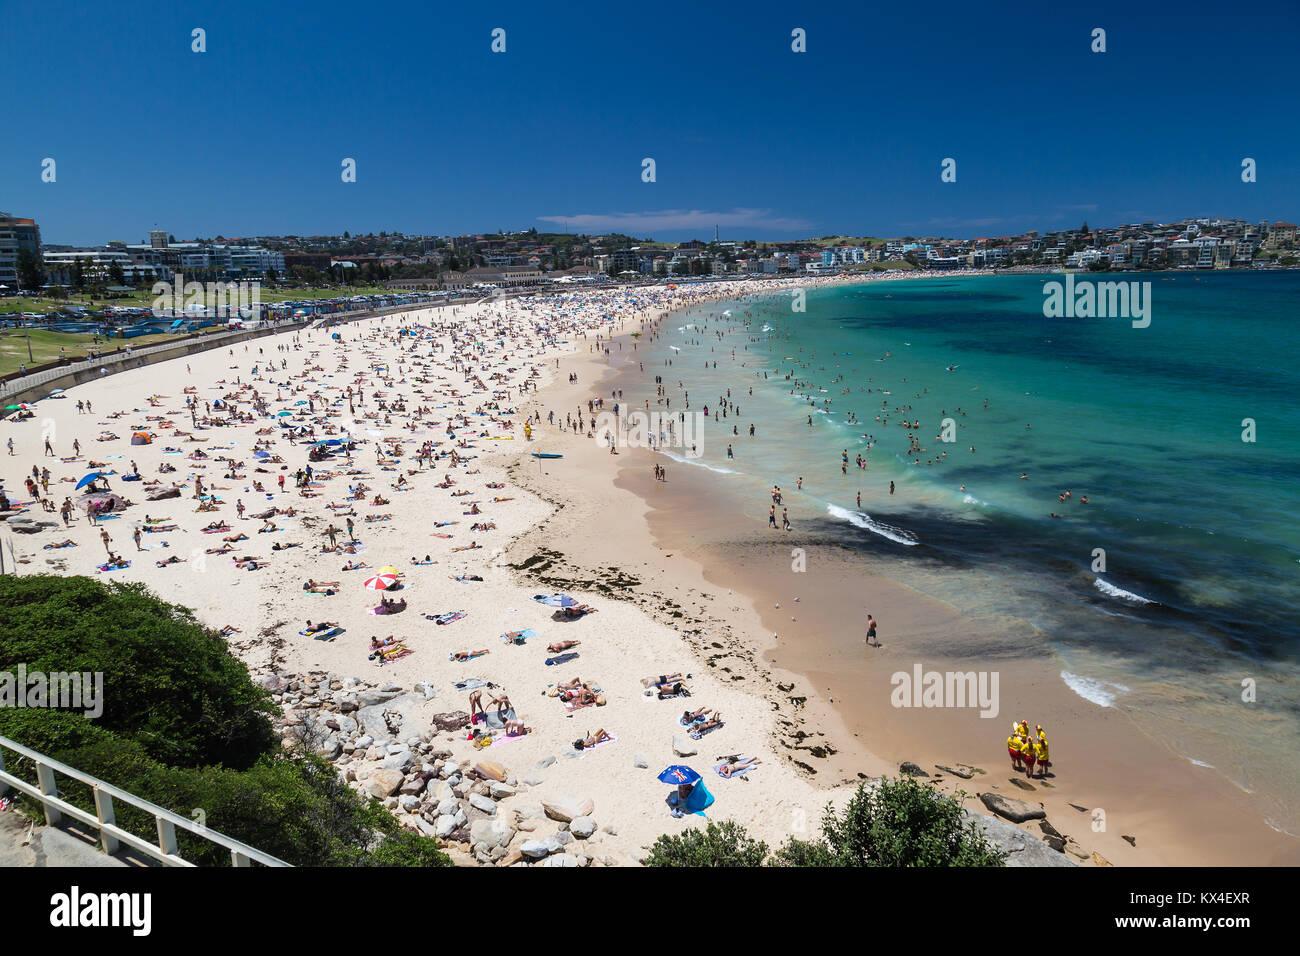 Crowds on Bondi Beach, Sydney, Australia. - Stock Image